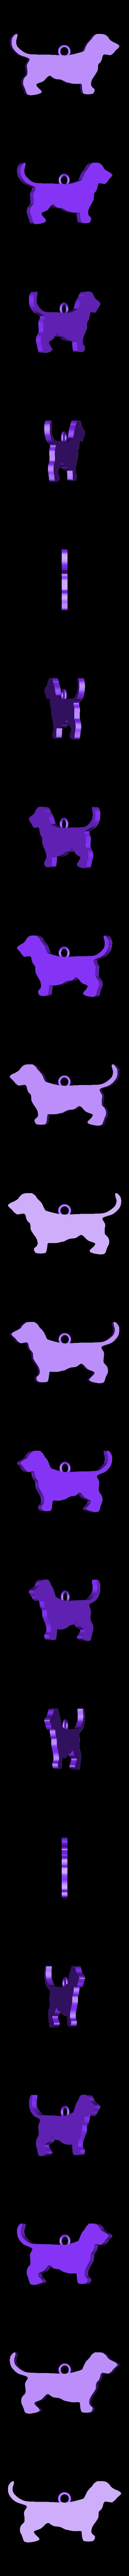 34.stl Download STL file Dogs • 3D printing object, GENNADI3313